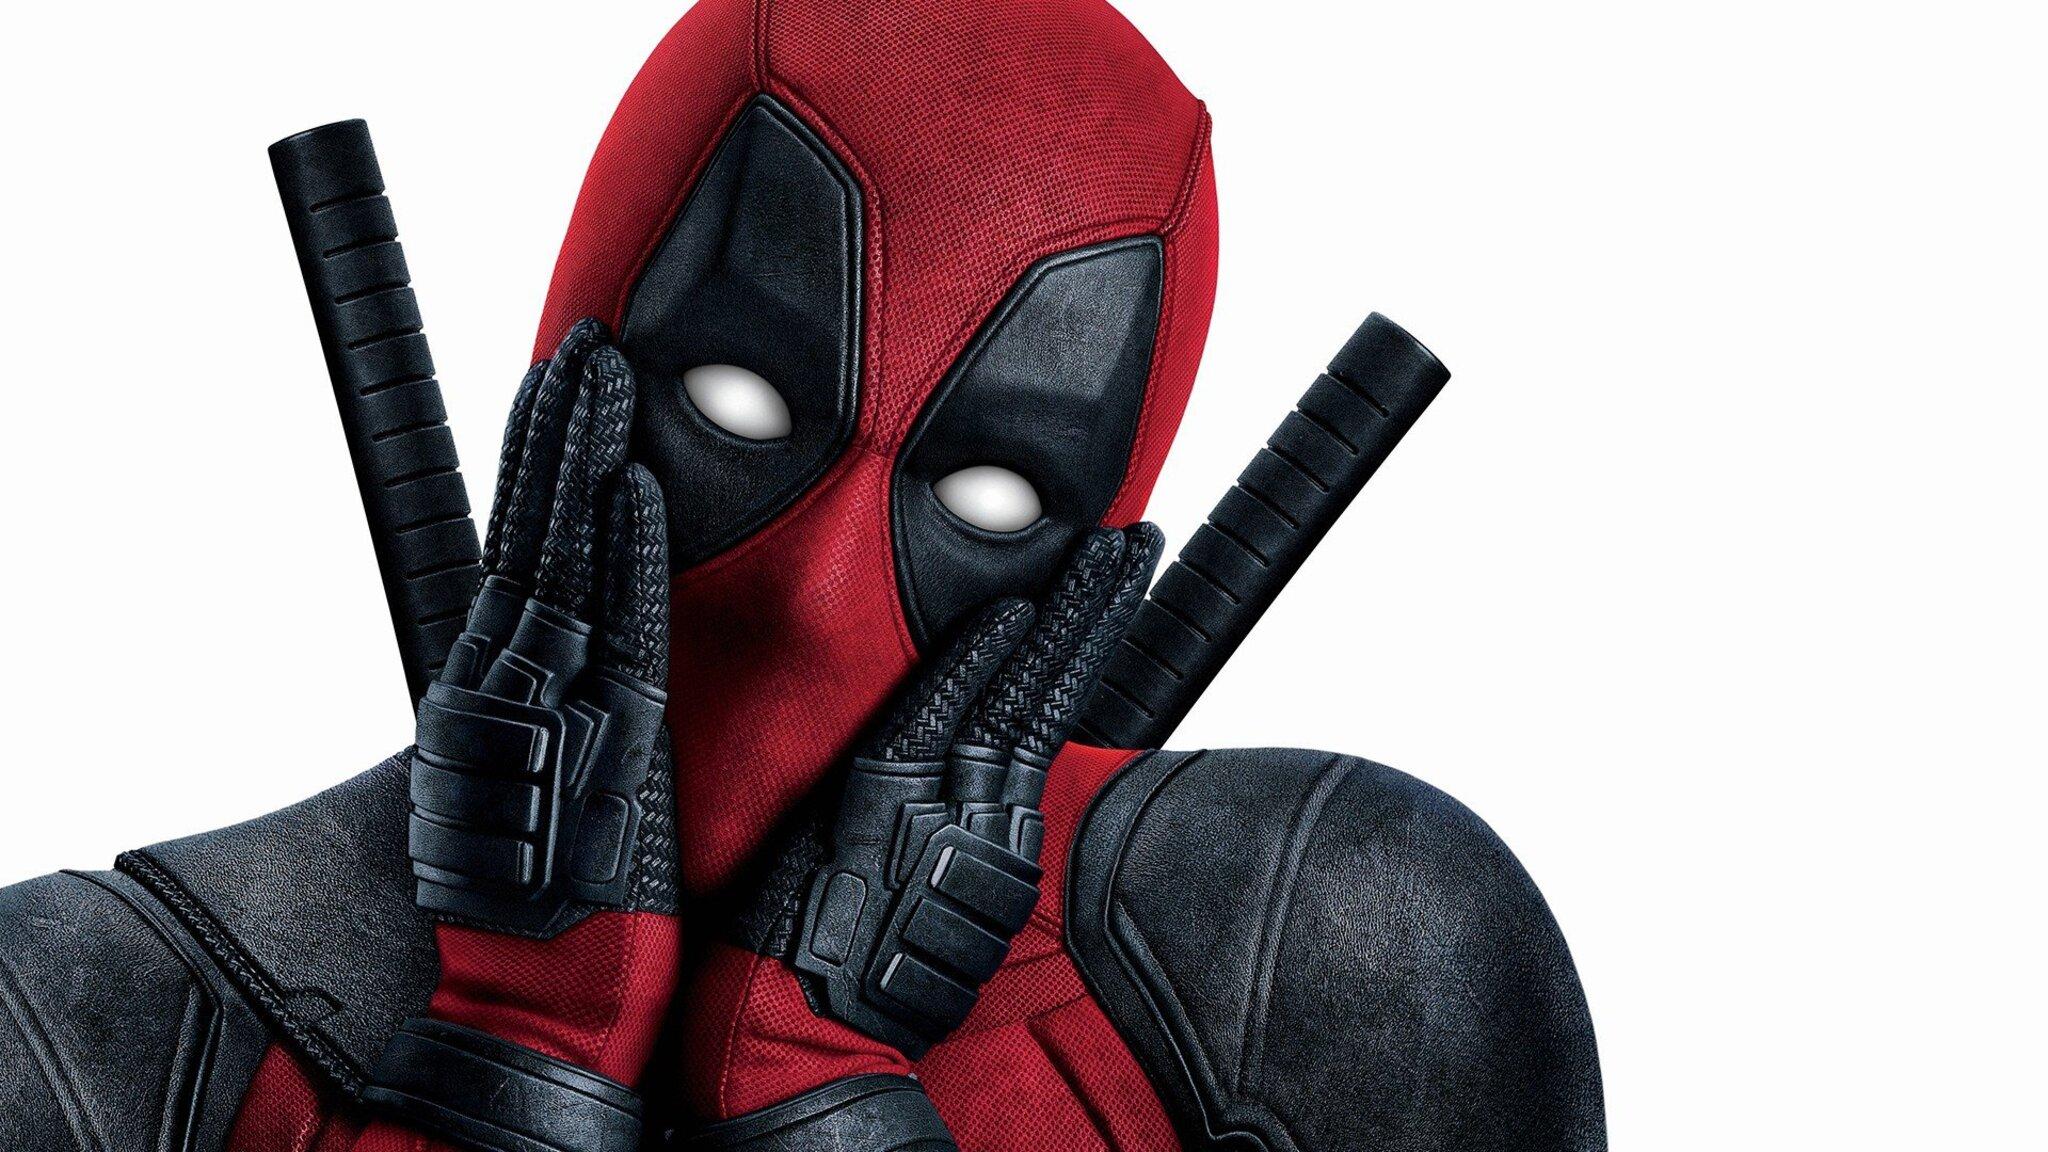 2048x1152 deadpool funny emotions 2048x1152 resolution hd - Deadpool download 1080p ...